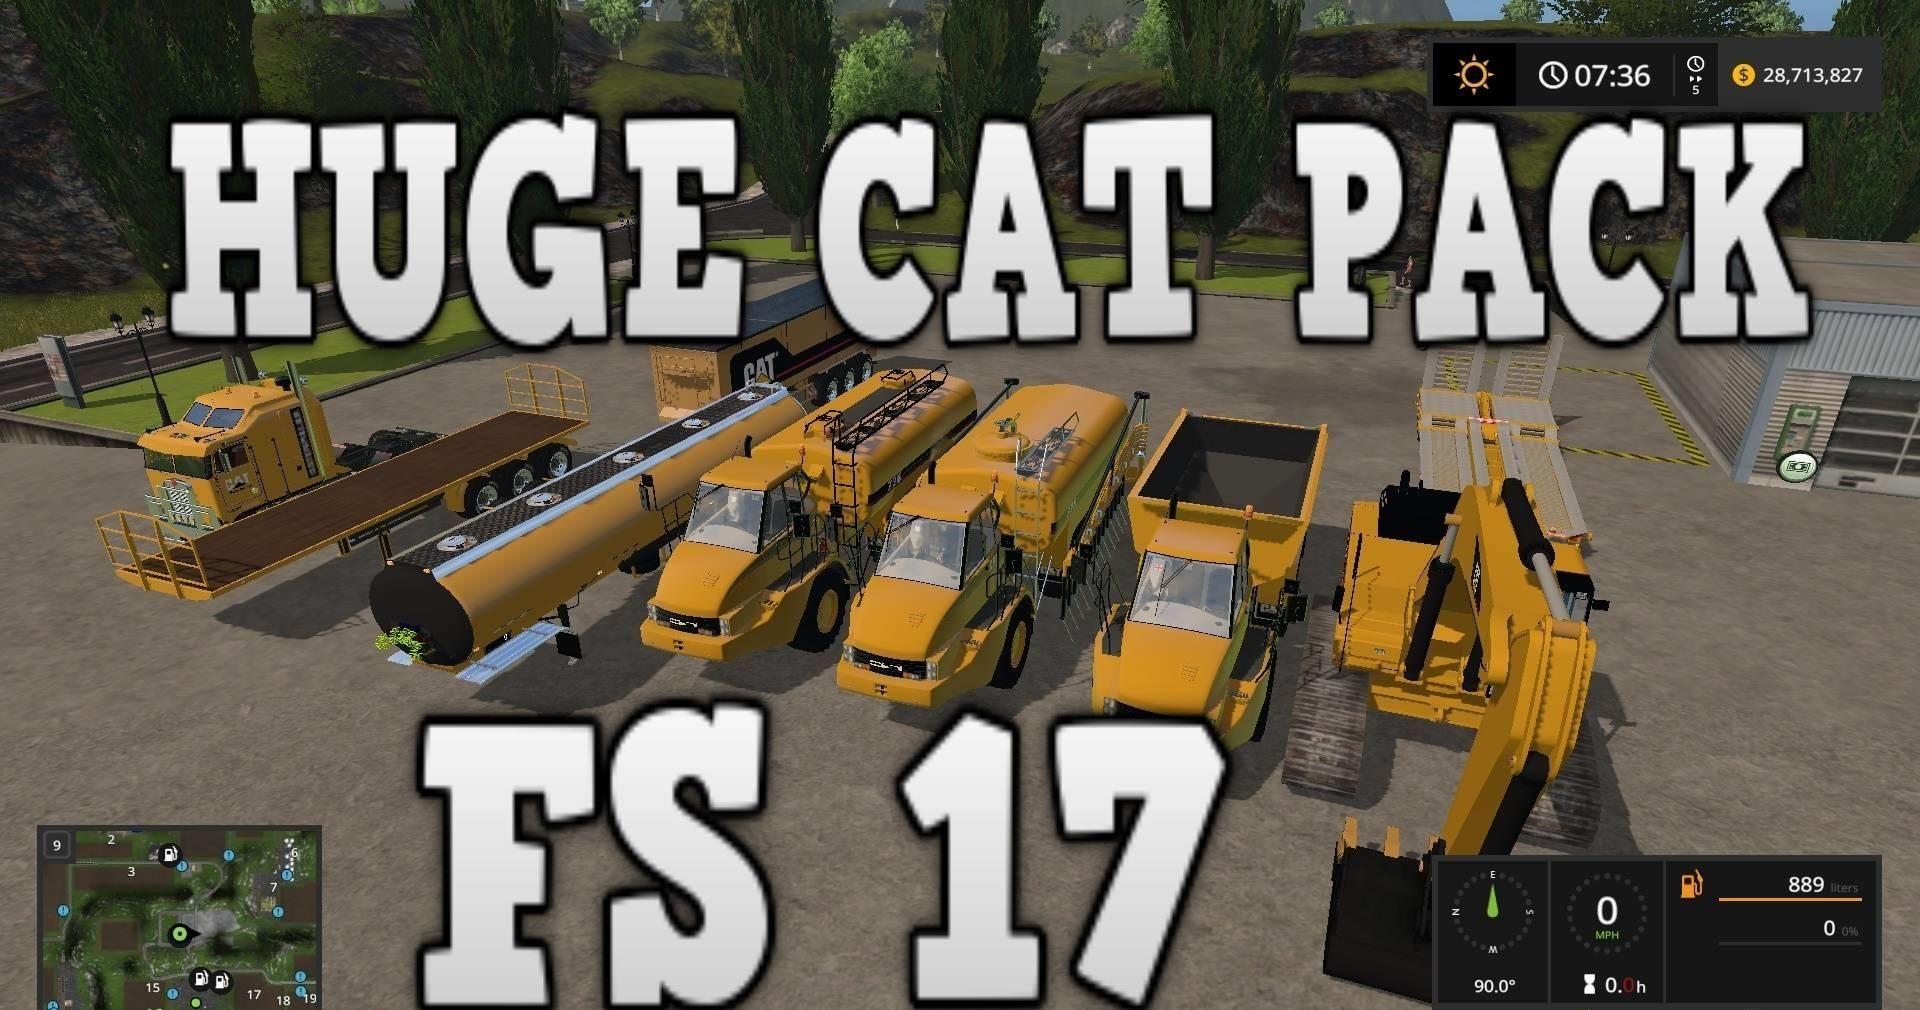 HUGE CAT PACK V2 0 FS17 - Farming Simulator 17 mod / FS 2017 mod